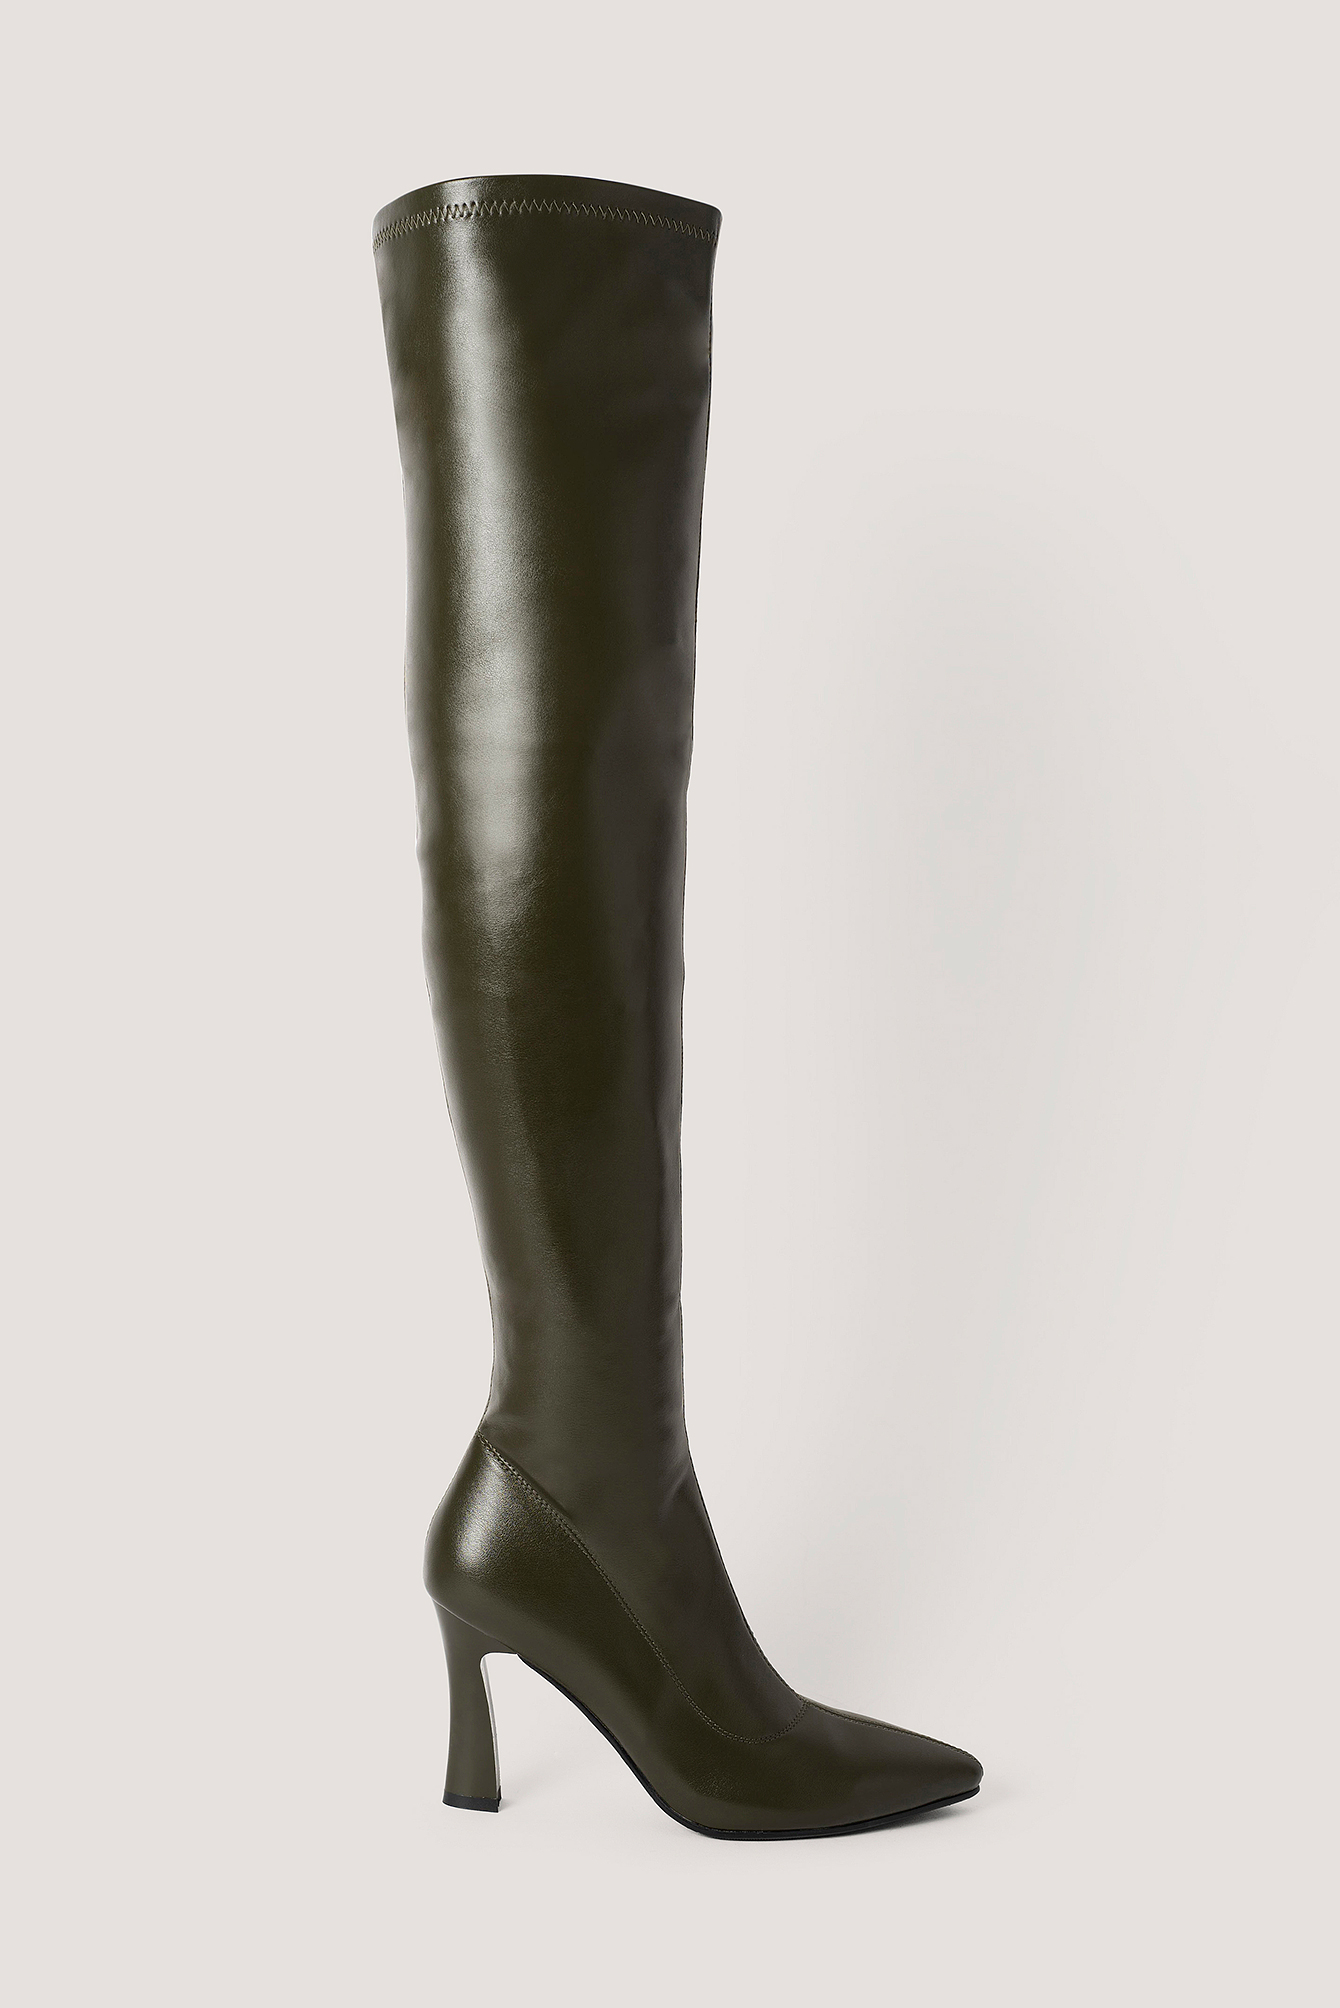 na-kd shoes -  Graphic Heel Overknee Boots - Green